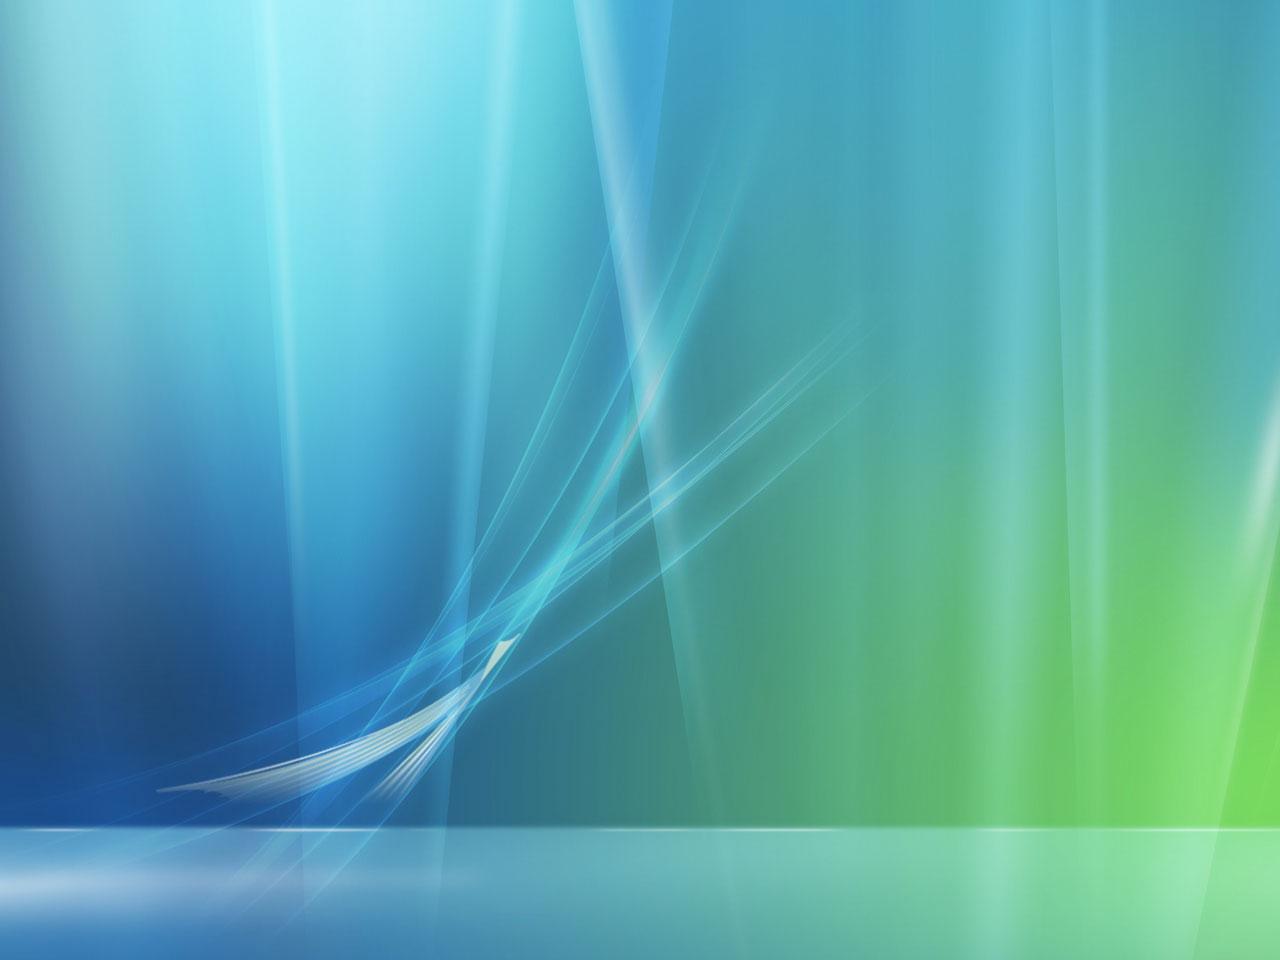 Windows Vista Aurora Original Hq Wallpapers Pictures Chainimage 1280x960